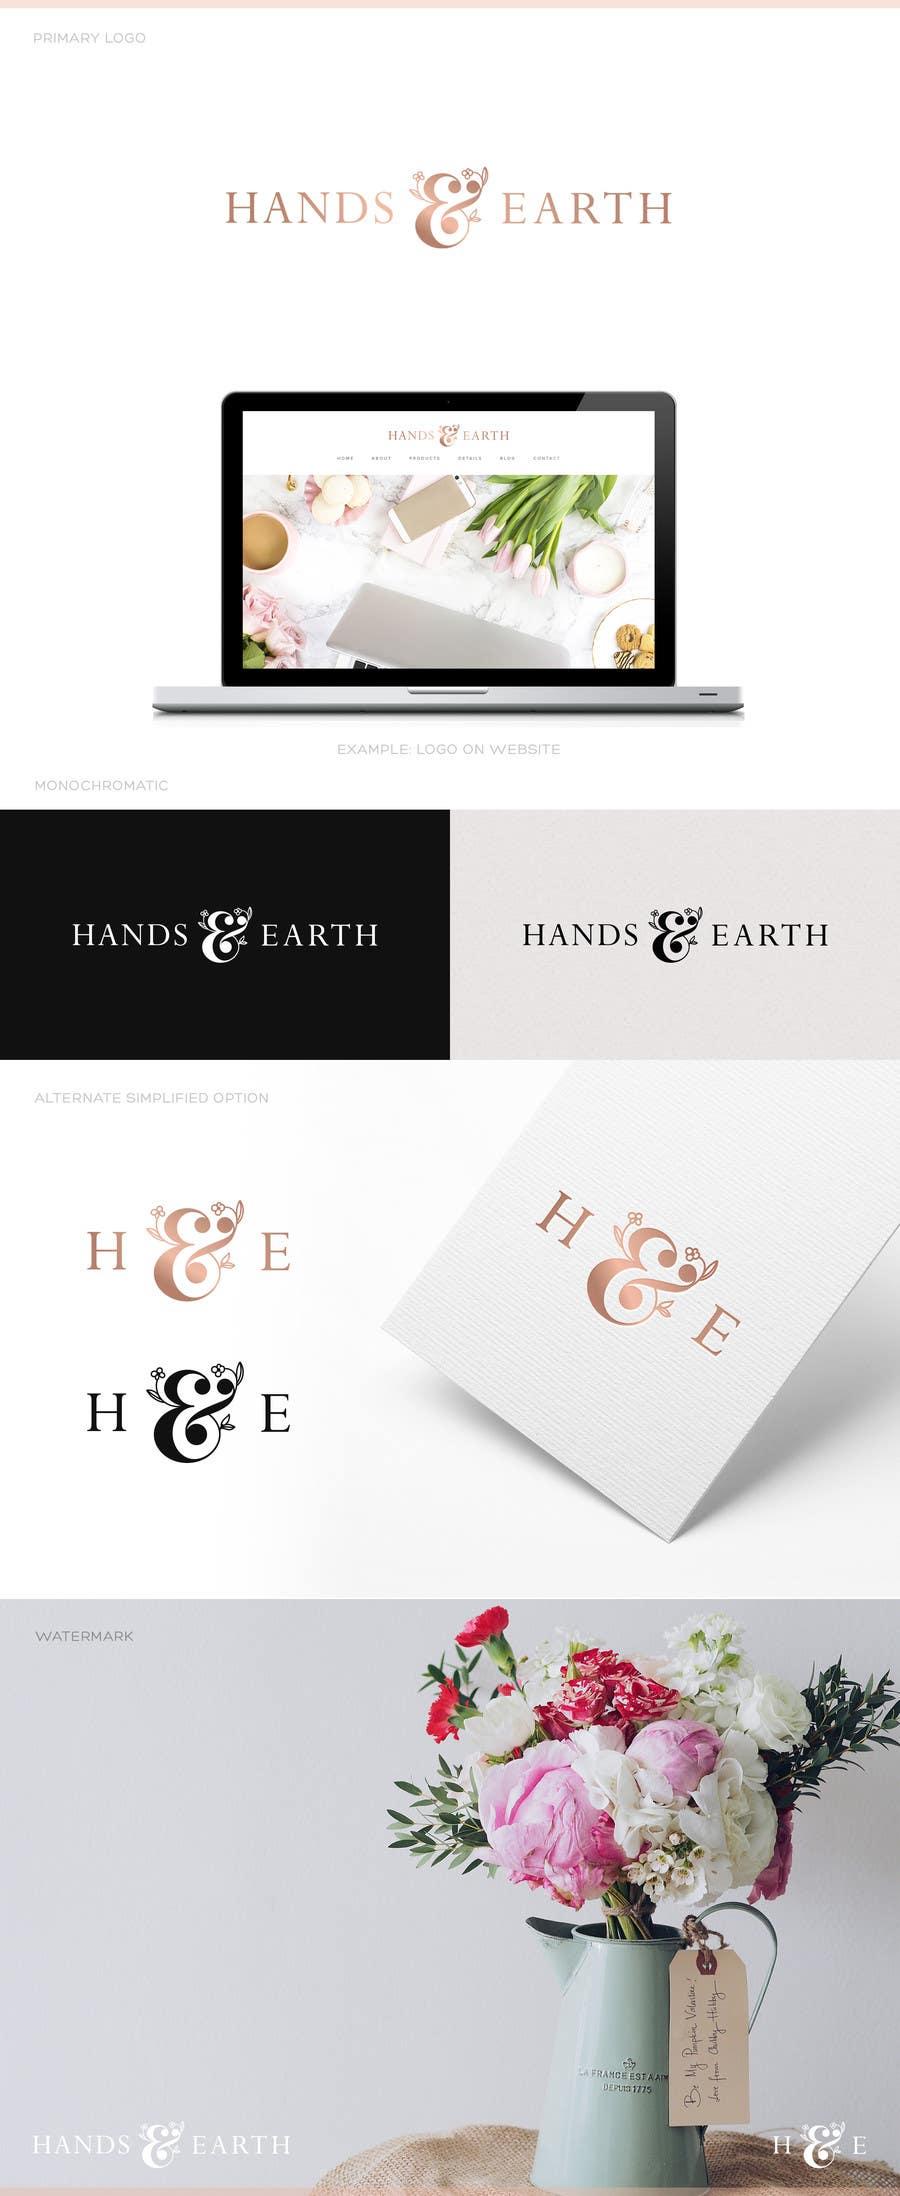 Proposition n°191 du concours Design a Logo for an online store